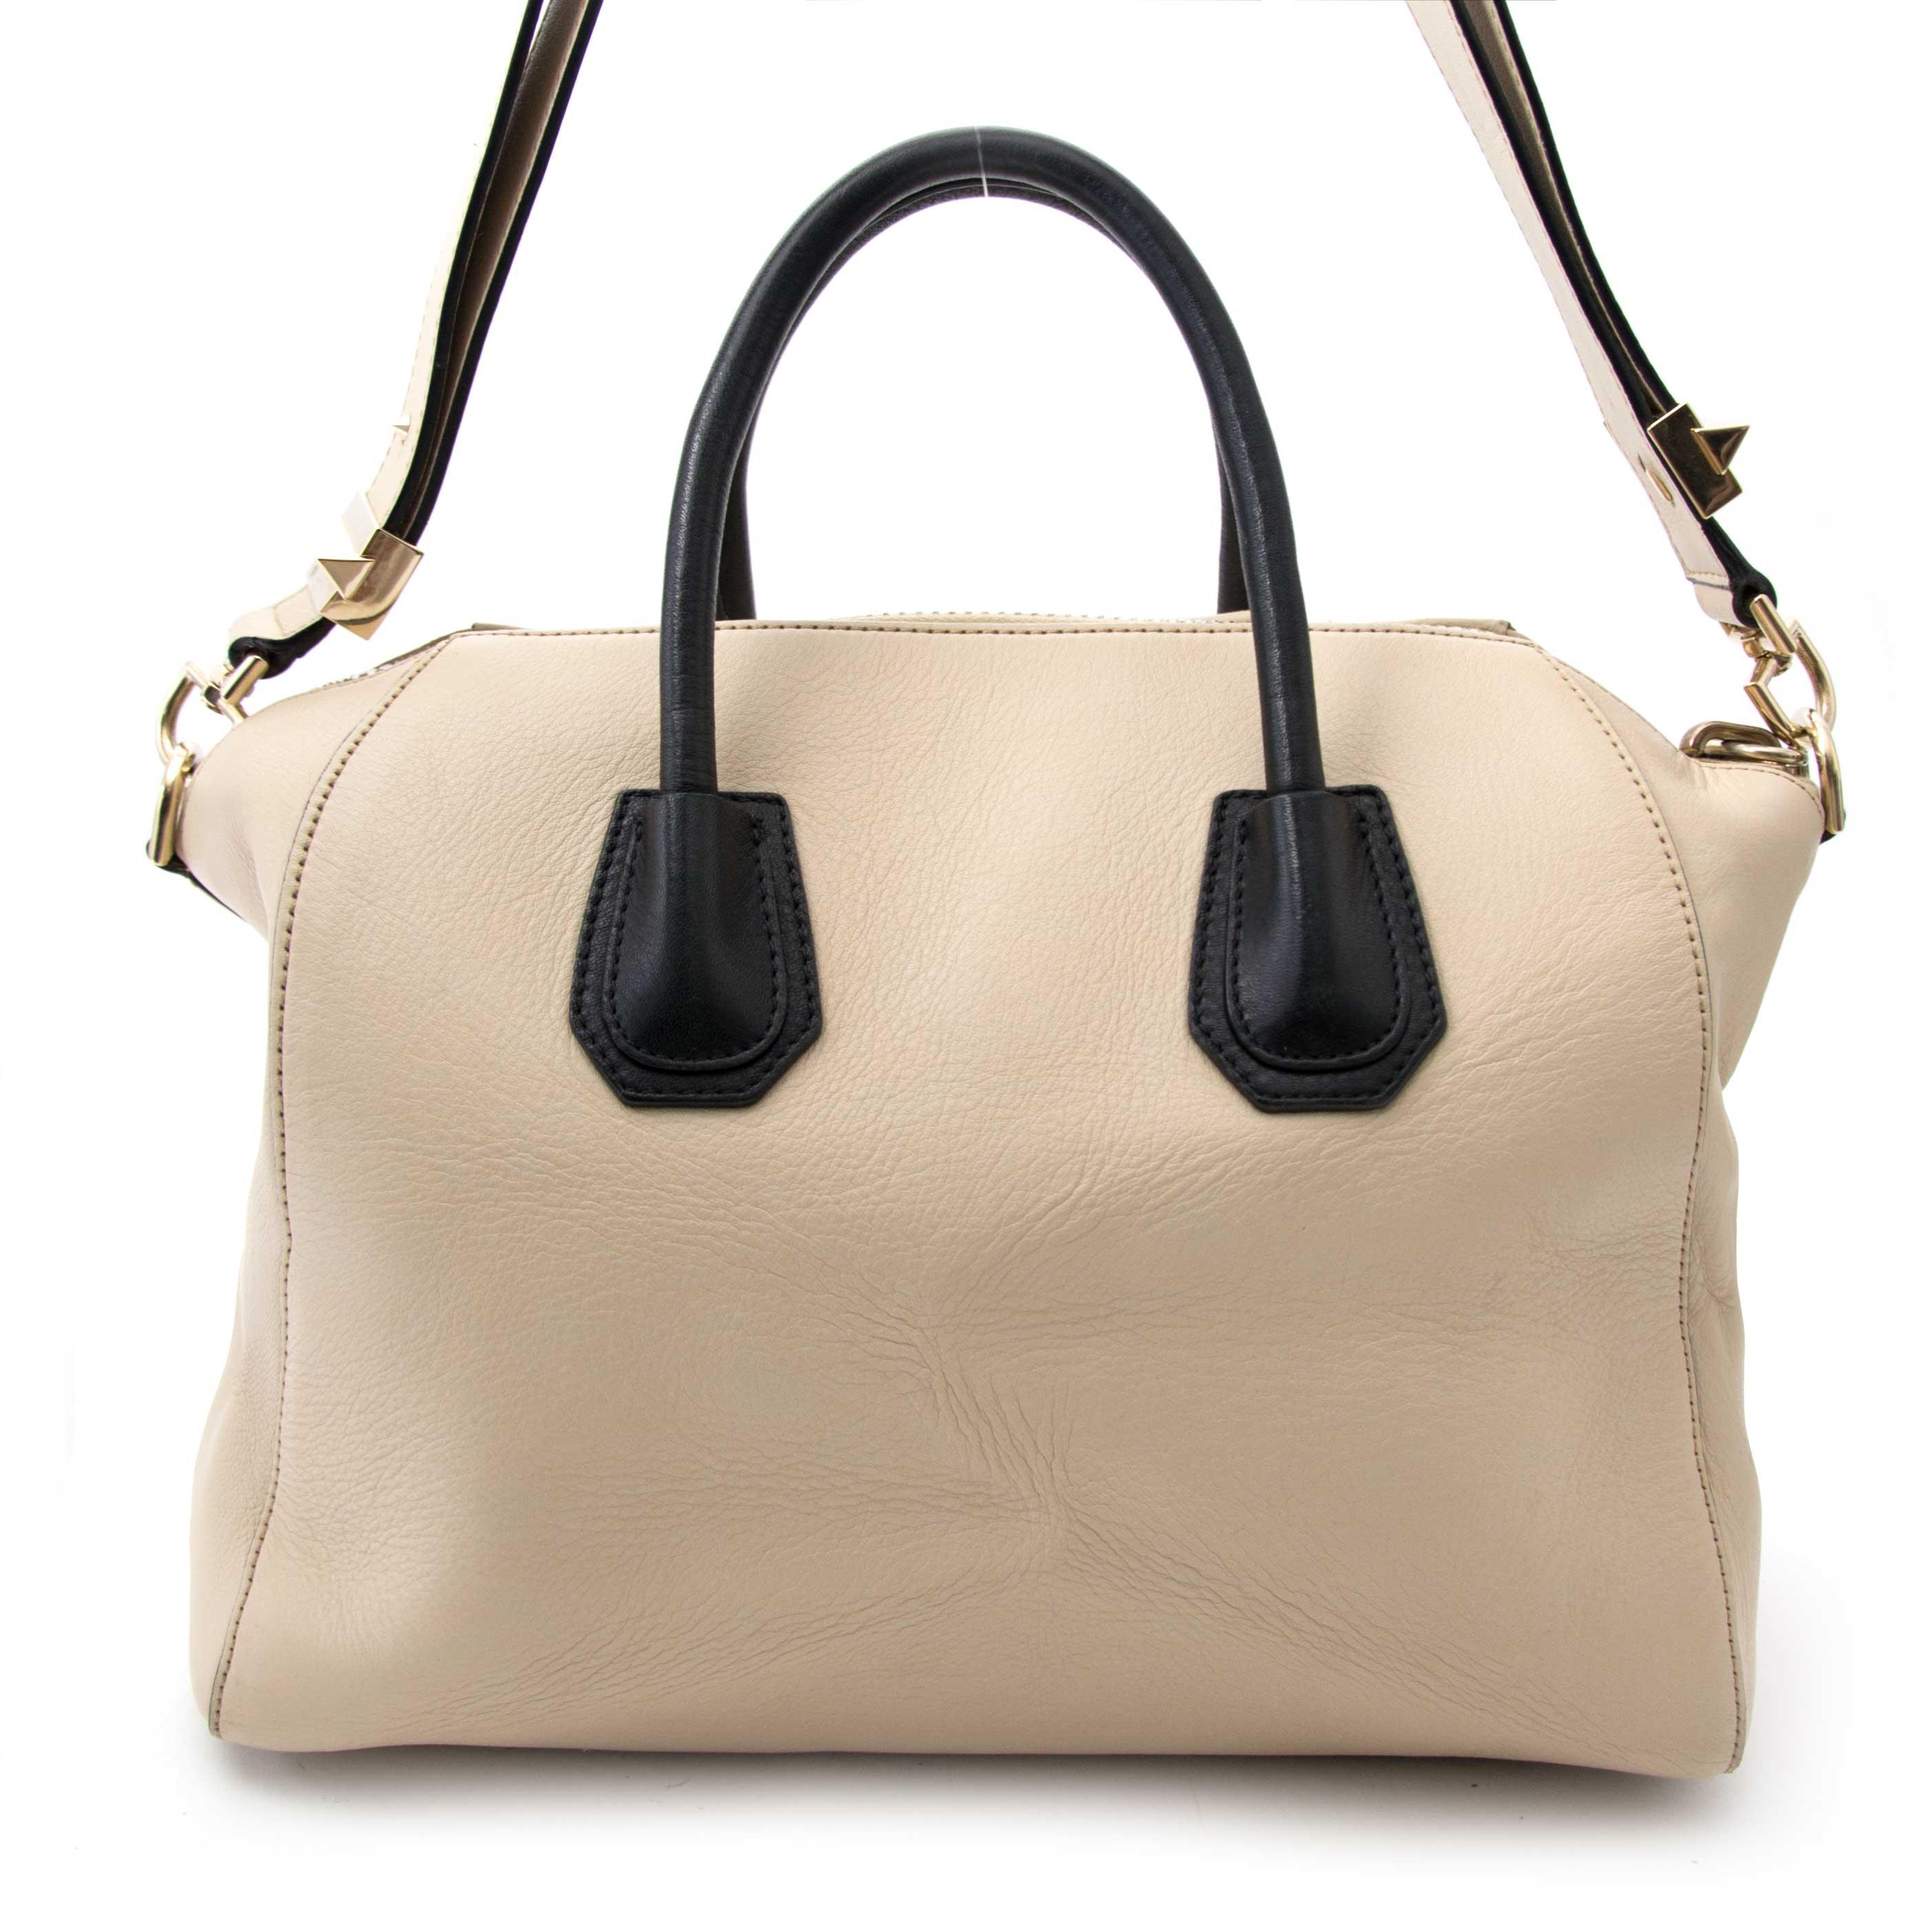 koop veilig online aan de beste prisj Givenchy Antigona Small Leather Tote Bag